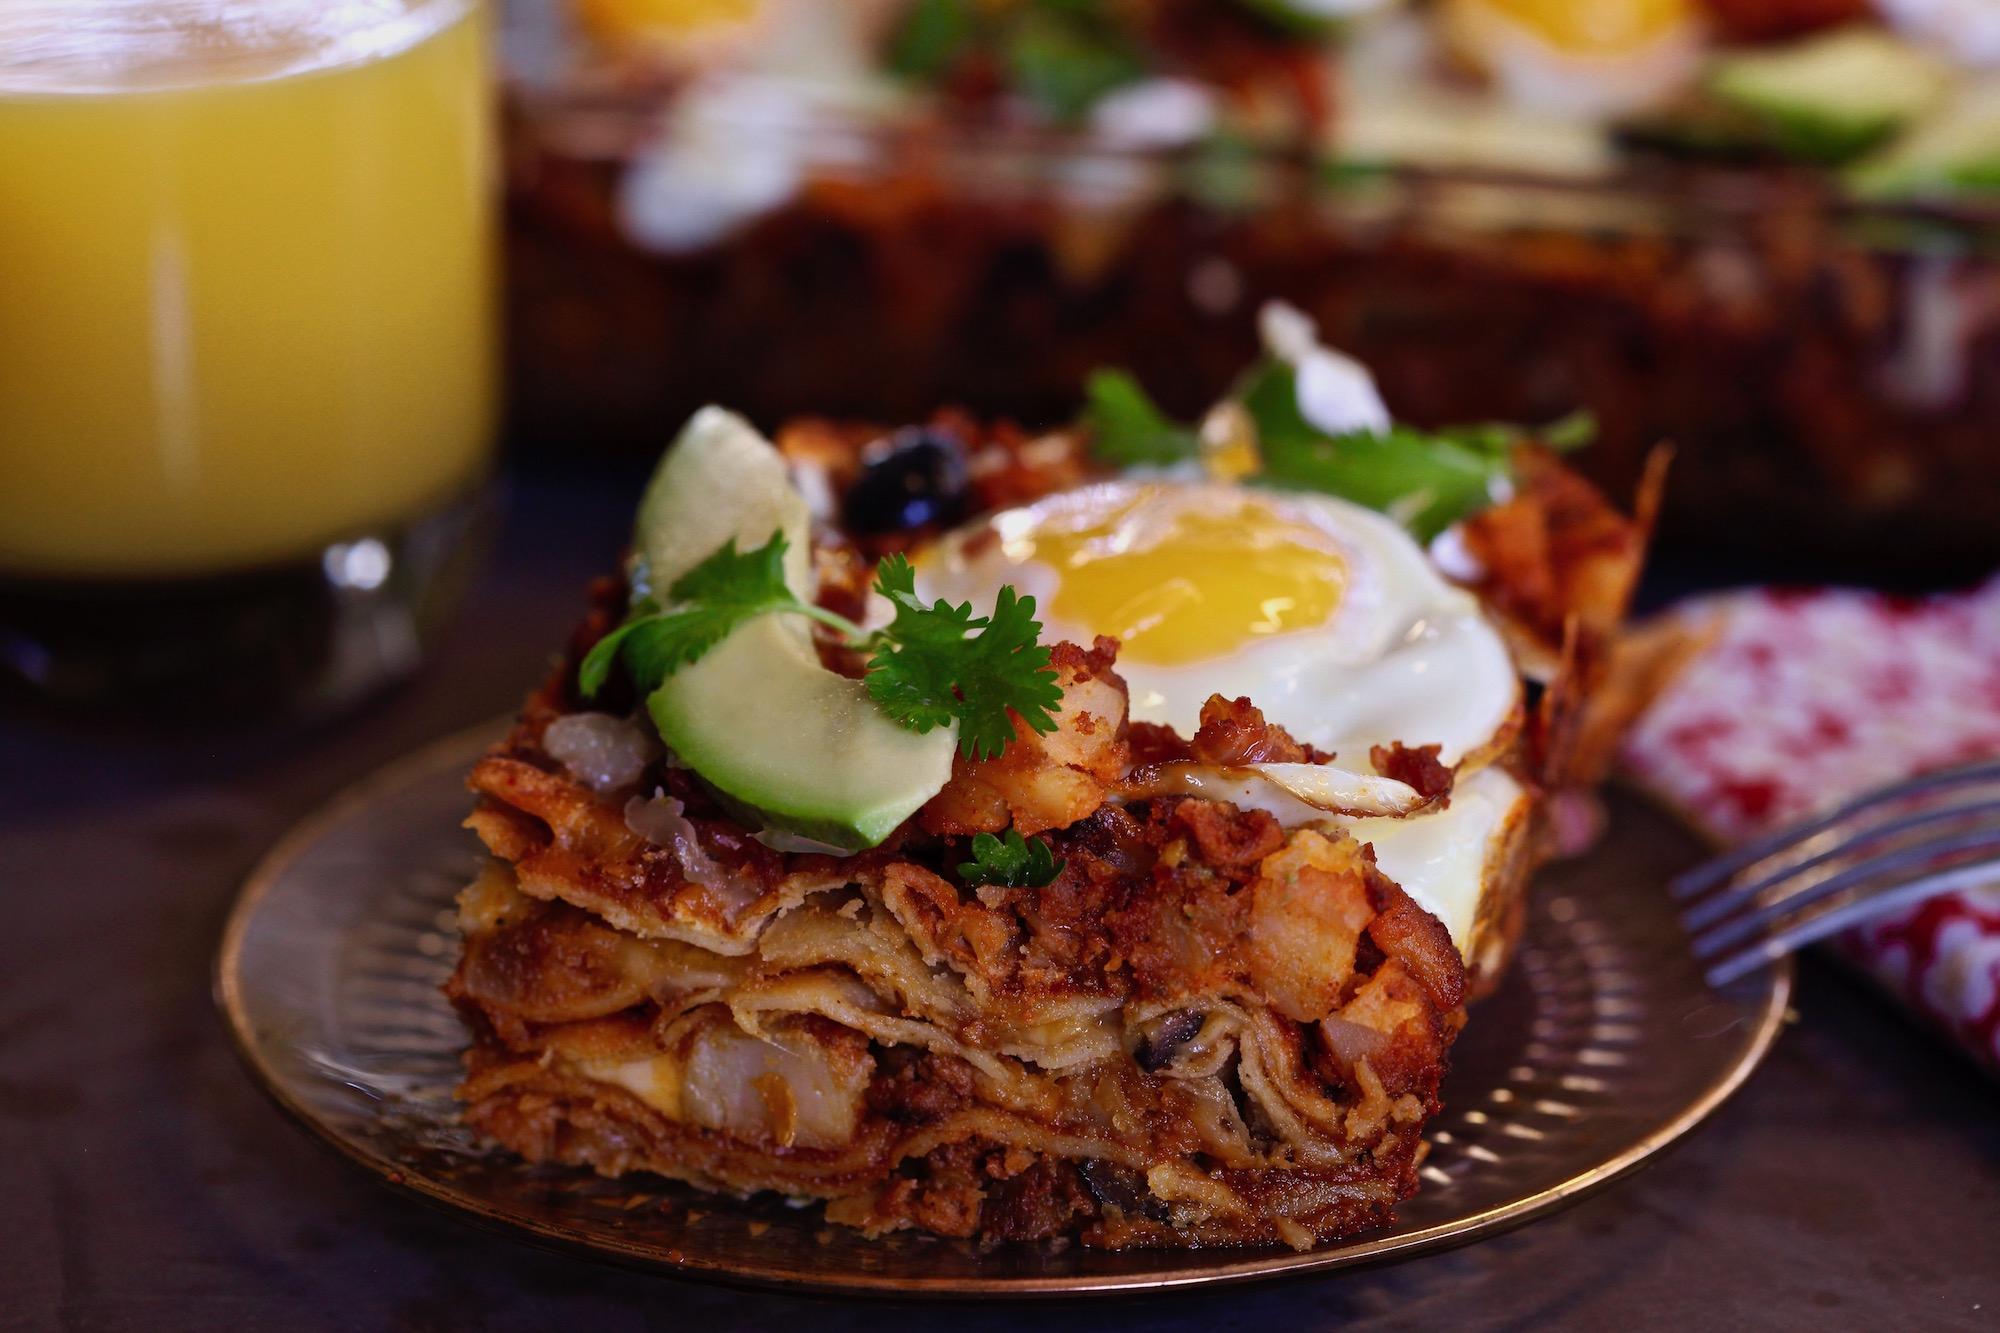 ¡Viva Mexico! Breakfast Enchiladas And An Arroz Con Leche Bar #giveaway #primeroALDI